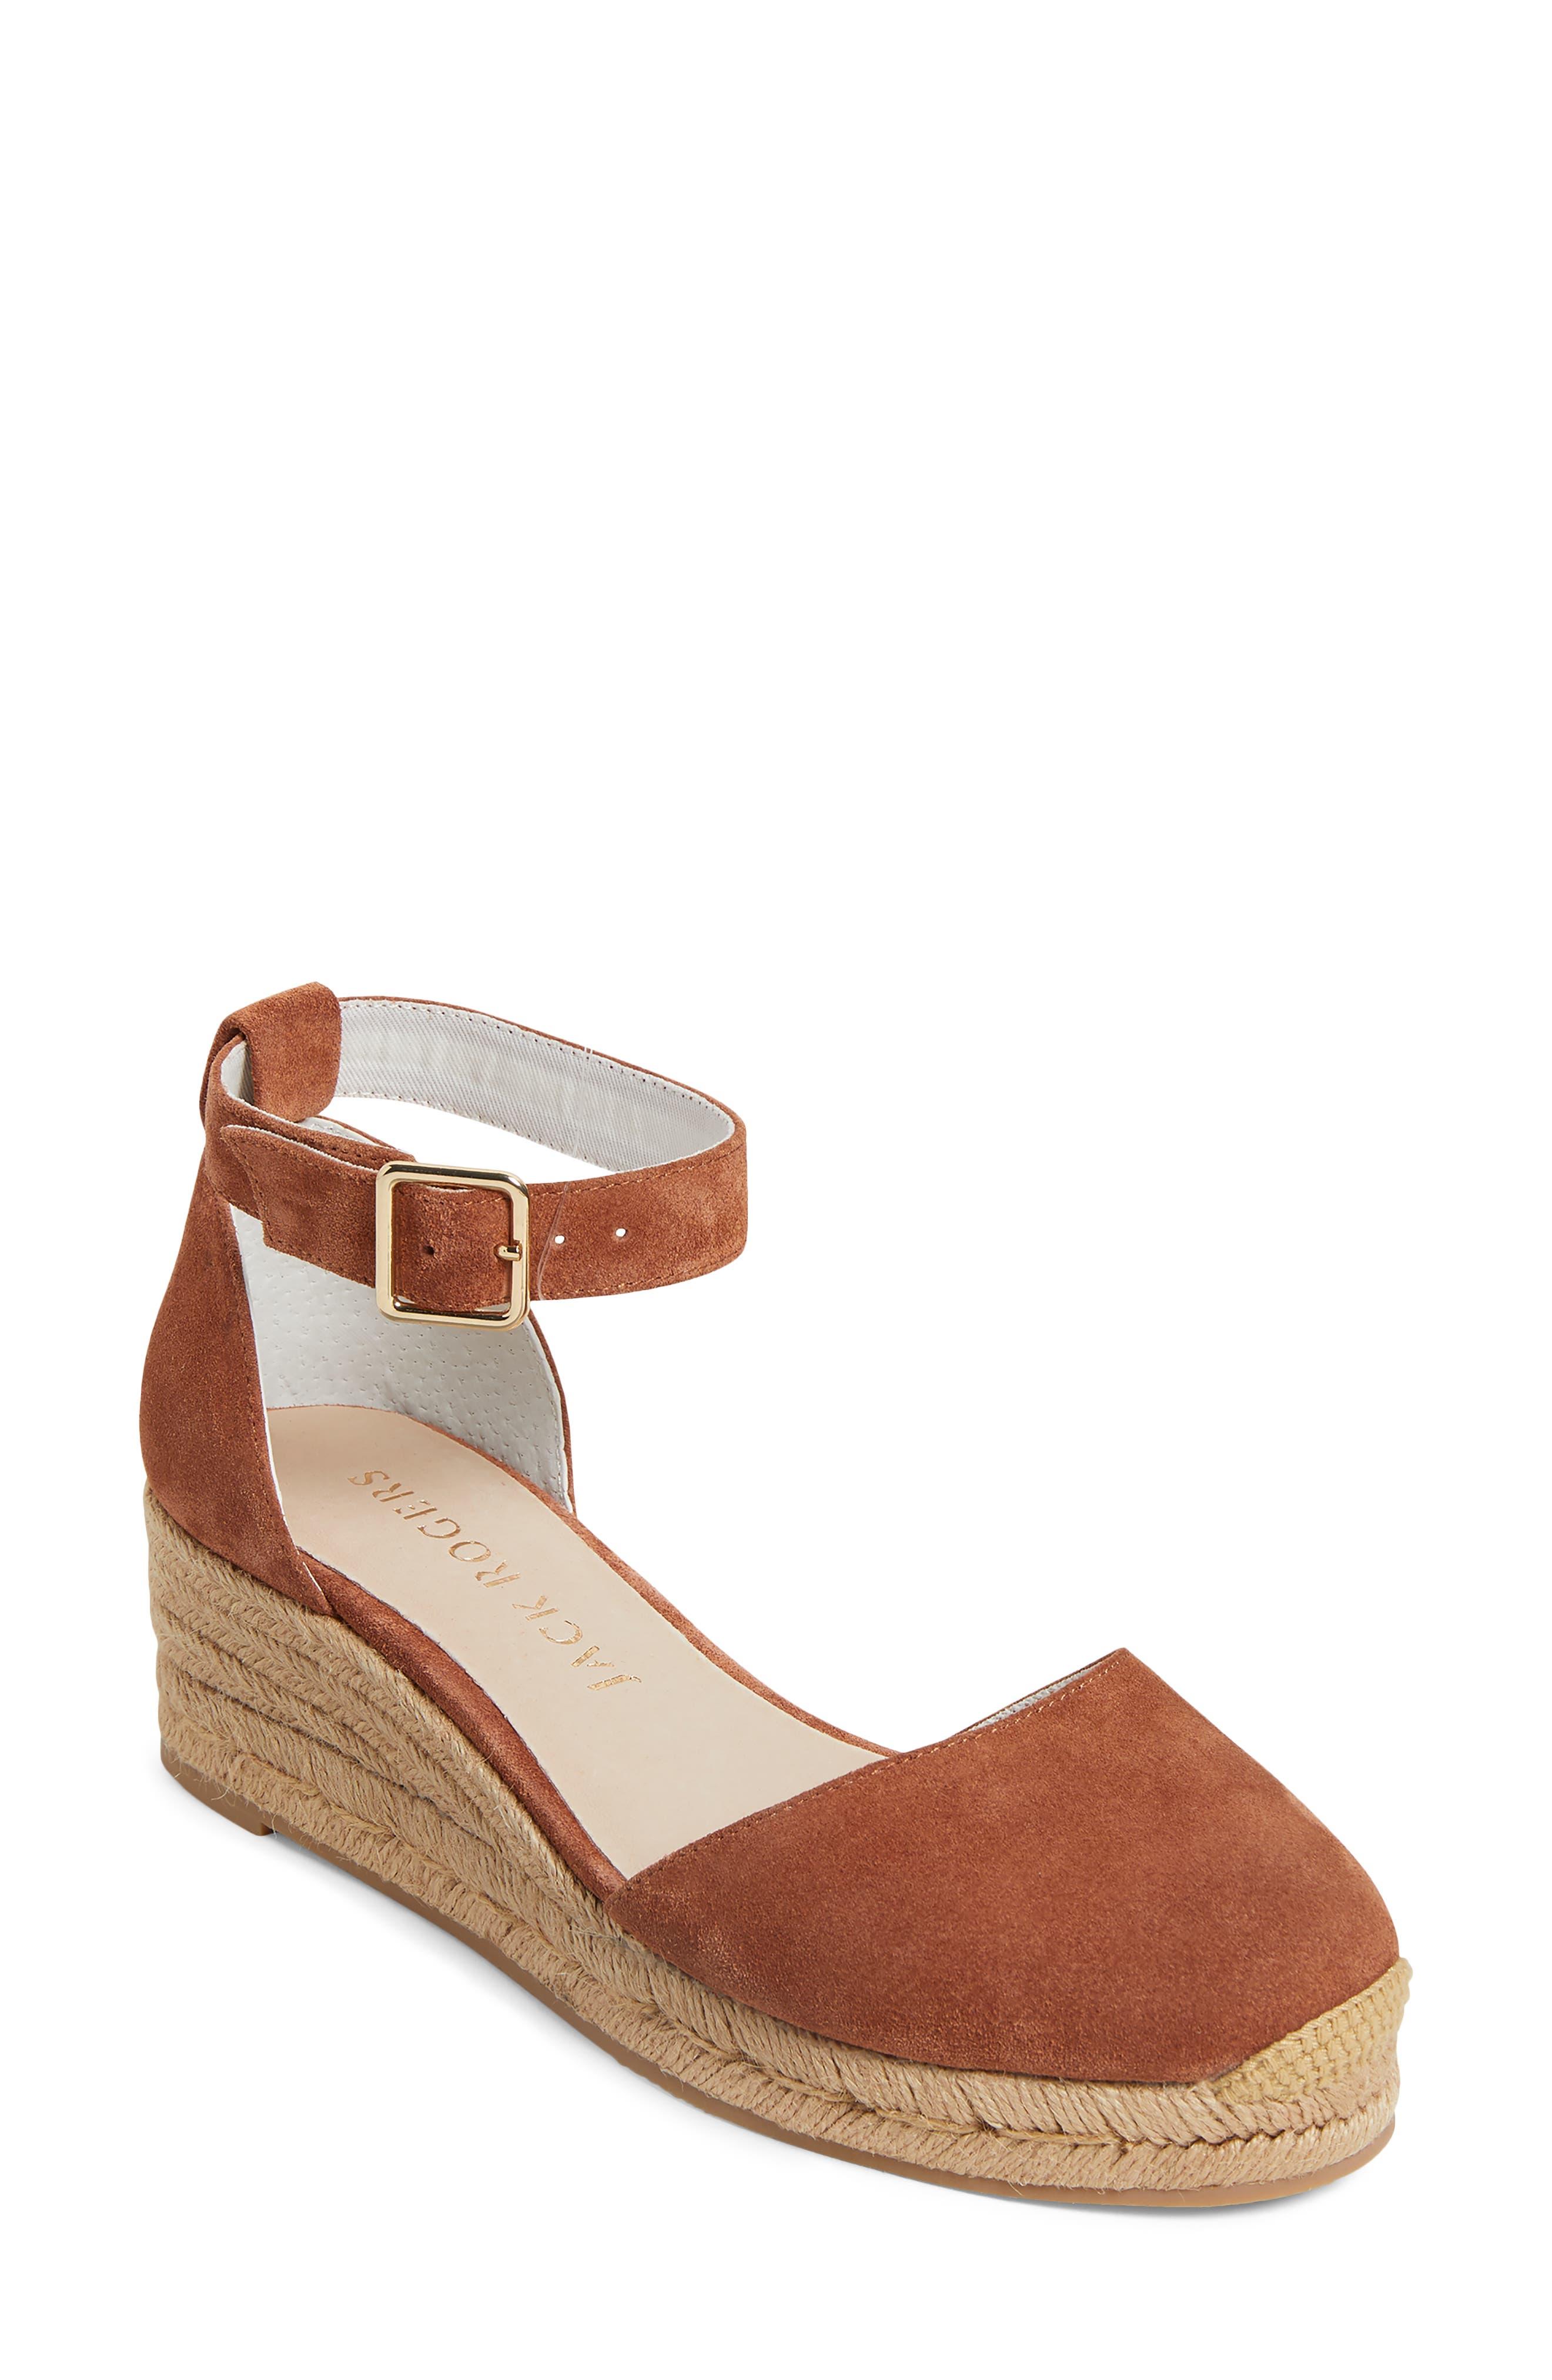 Palmer Ankle Strap Espadrille Wedge